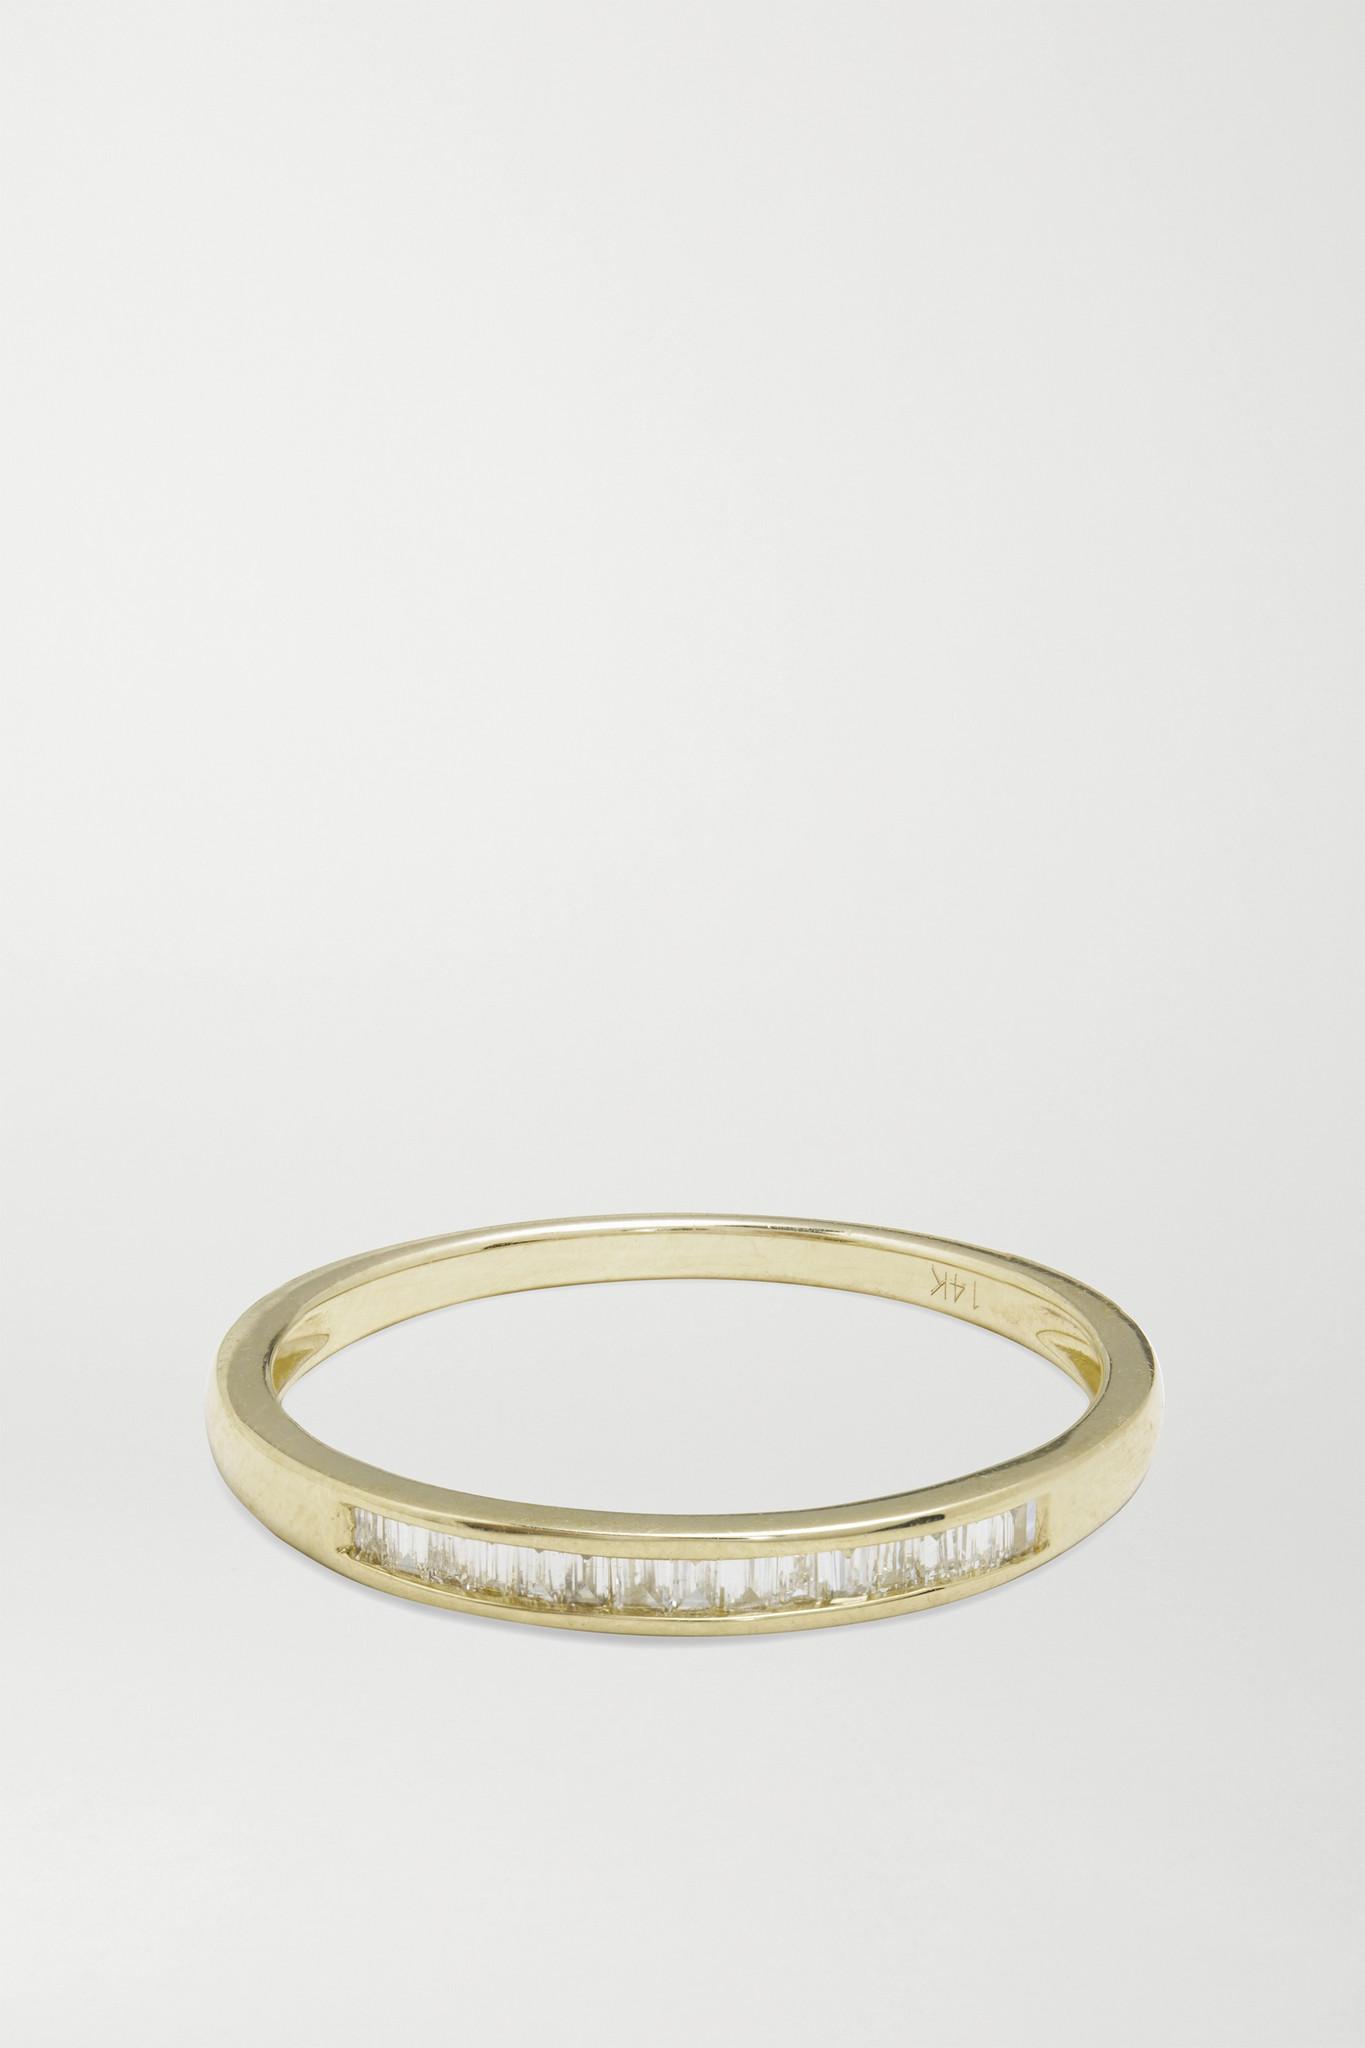 STONE AND STRAND - On The Upside 14-karat Gold Diamond Ring - 5